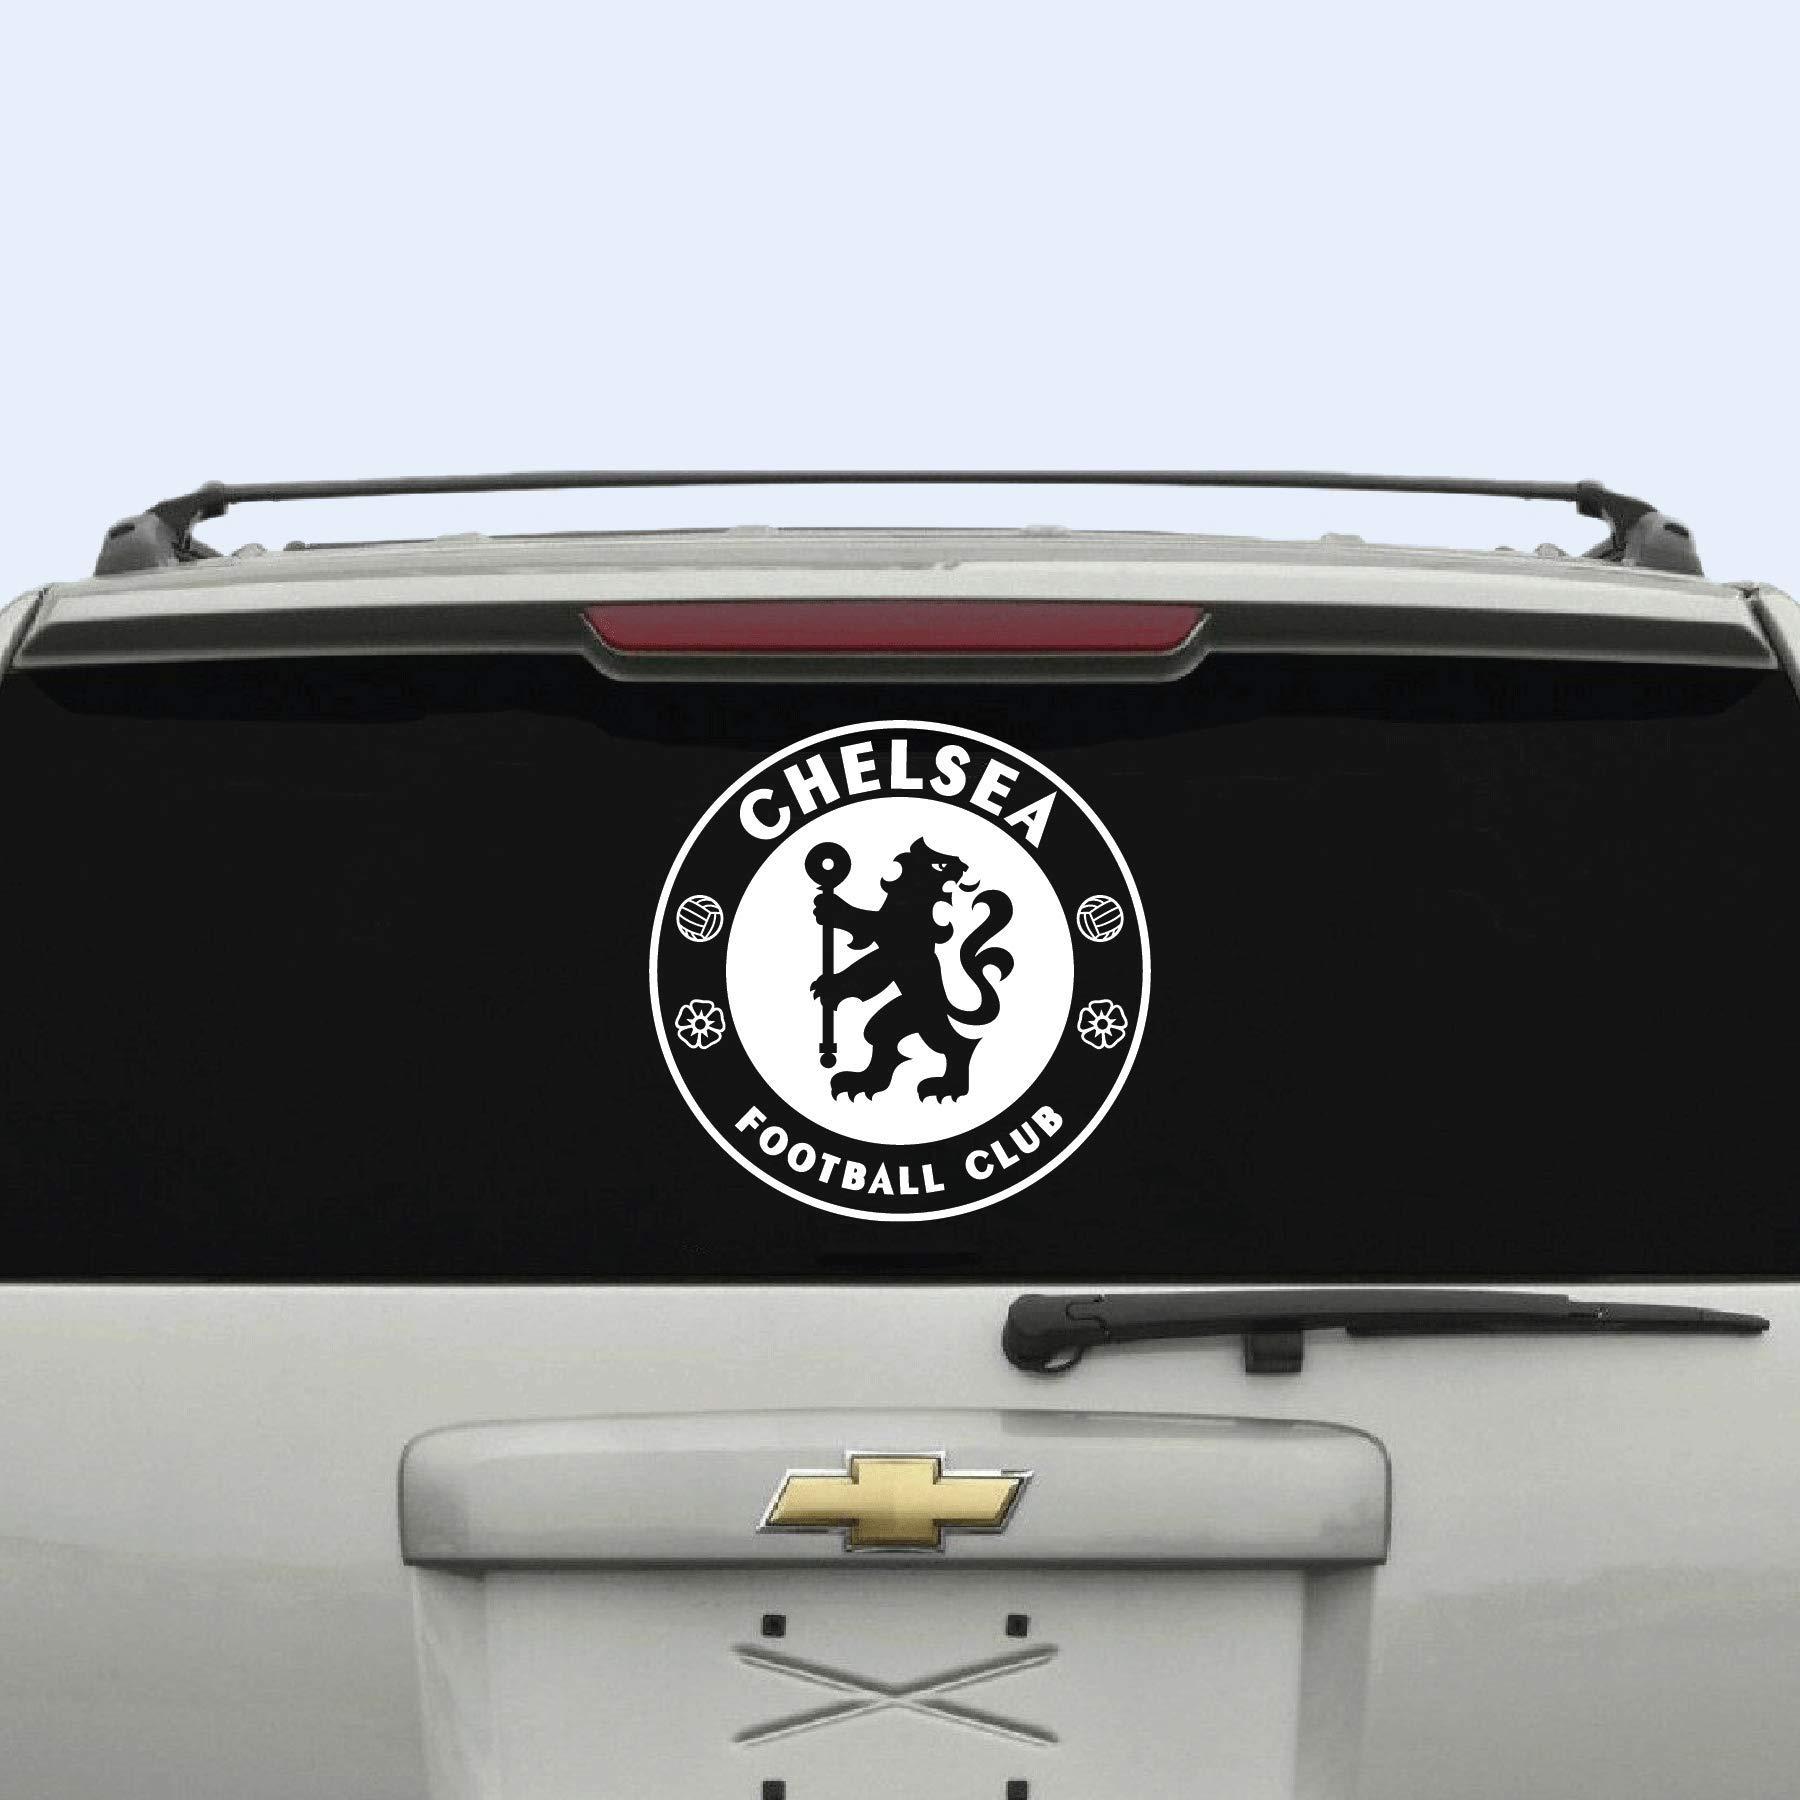 6 Chelsea Fc Car Window Decal Sticker Football Club Buy Online In Angola At Angola Desertcart Com Productid 172643615 [ 1800 x 1800 Pixel ]